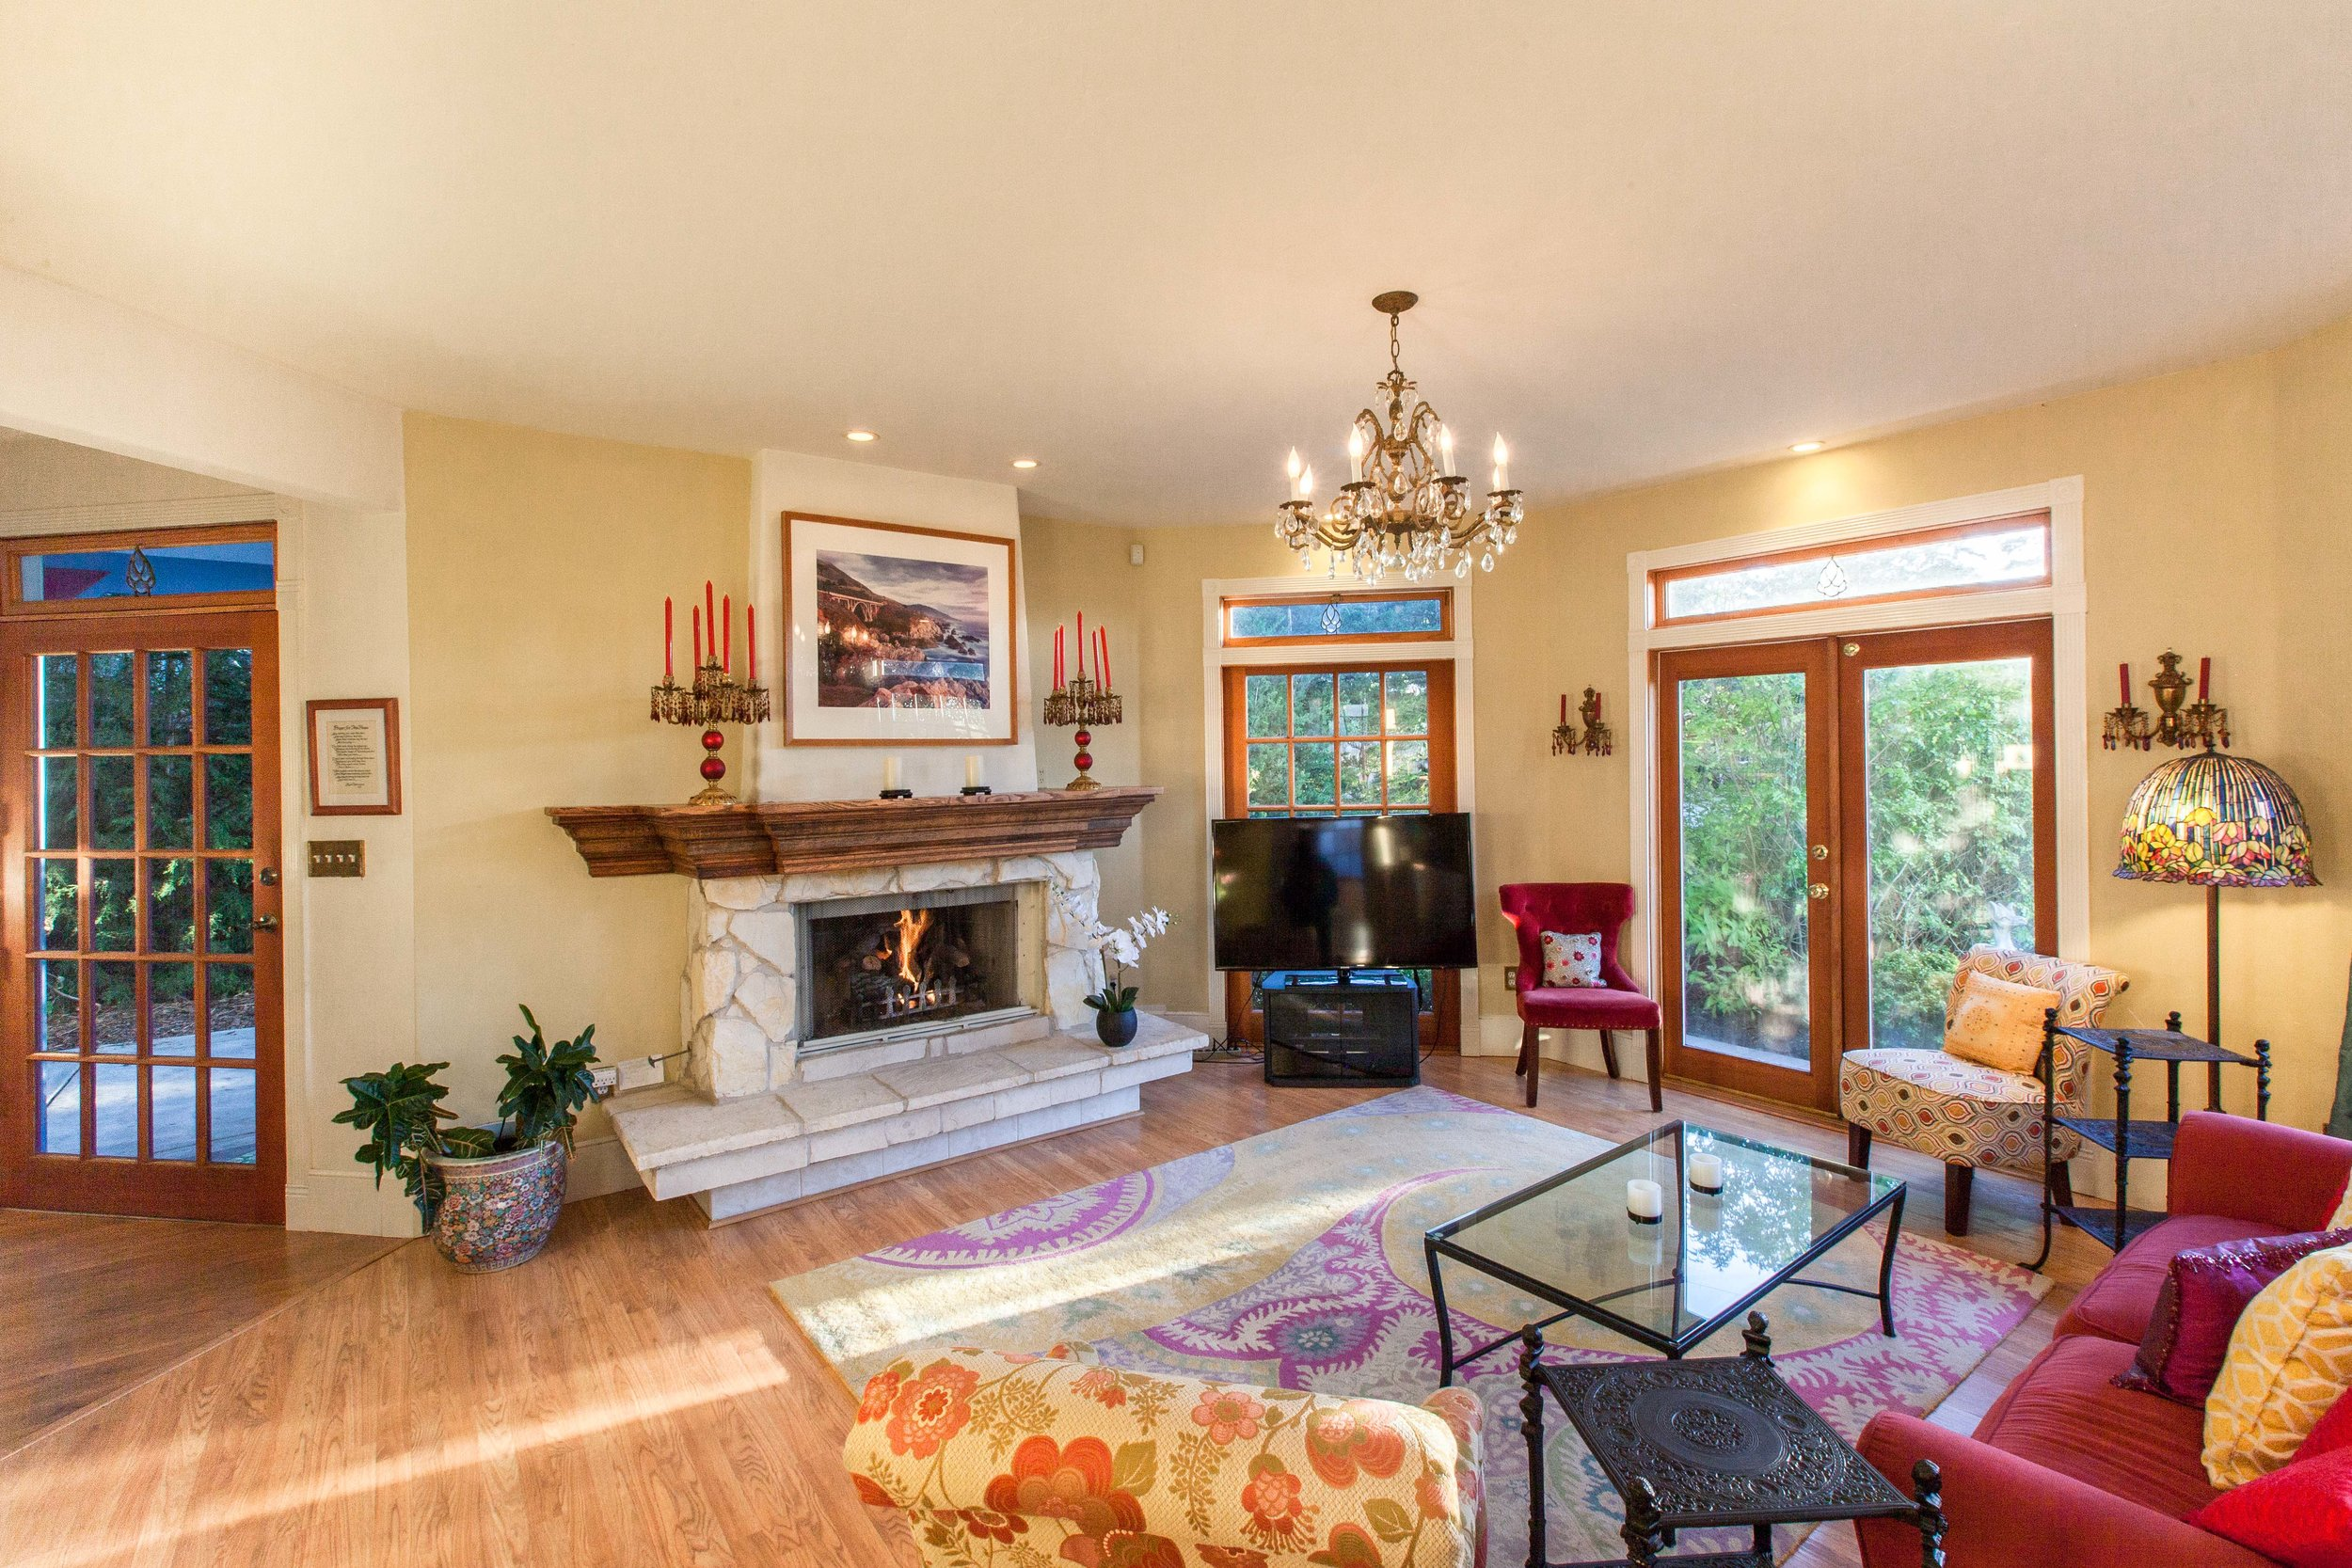 3 Living Room Fireplace.jpg